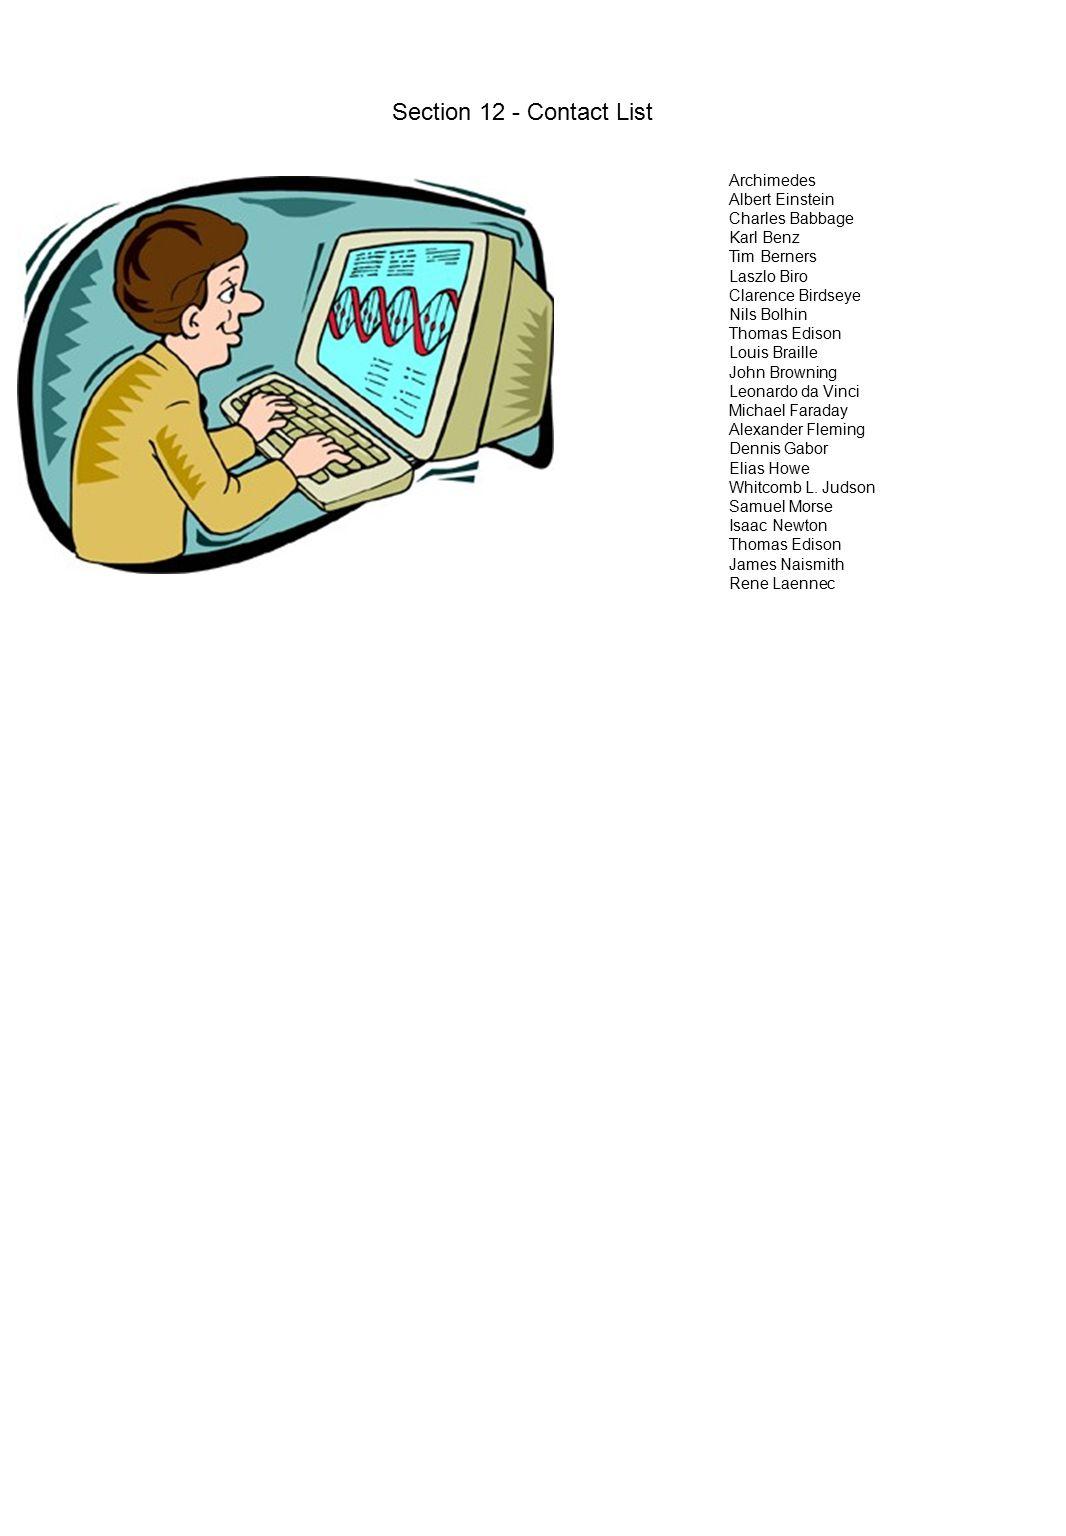 Section 12 - Contact List Archimedes Albert Einstein Charles Babbage Karl Benz Tim Berners Laszlo Biro Clarence Birdseye Nils Bolhin Thomas Edison Louis Braille John Browning Leonardo da Vinci Michael Faraday Alexander Fleming Dennis Gabor Elias Howe Whitcomb L.